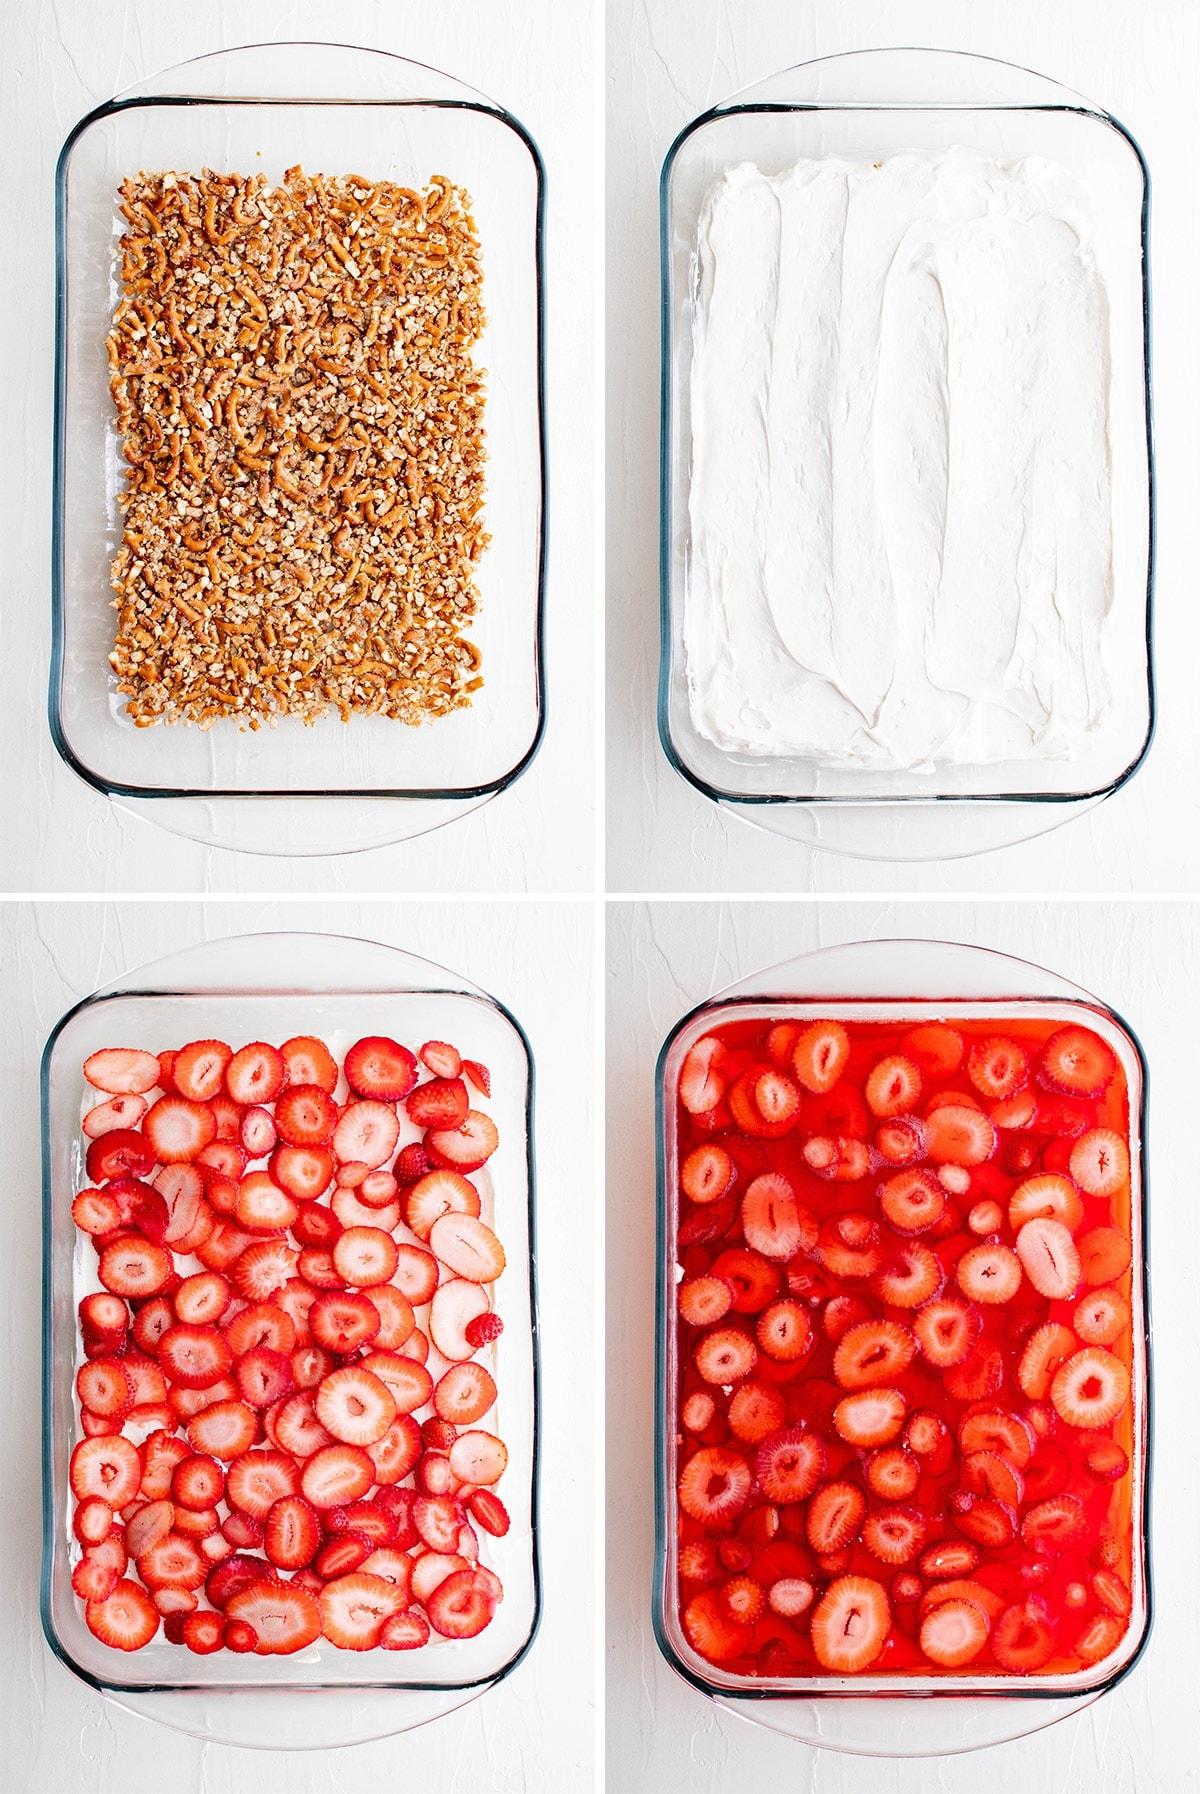 collage of images showing steps to make strawberry pretzel salad